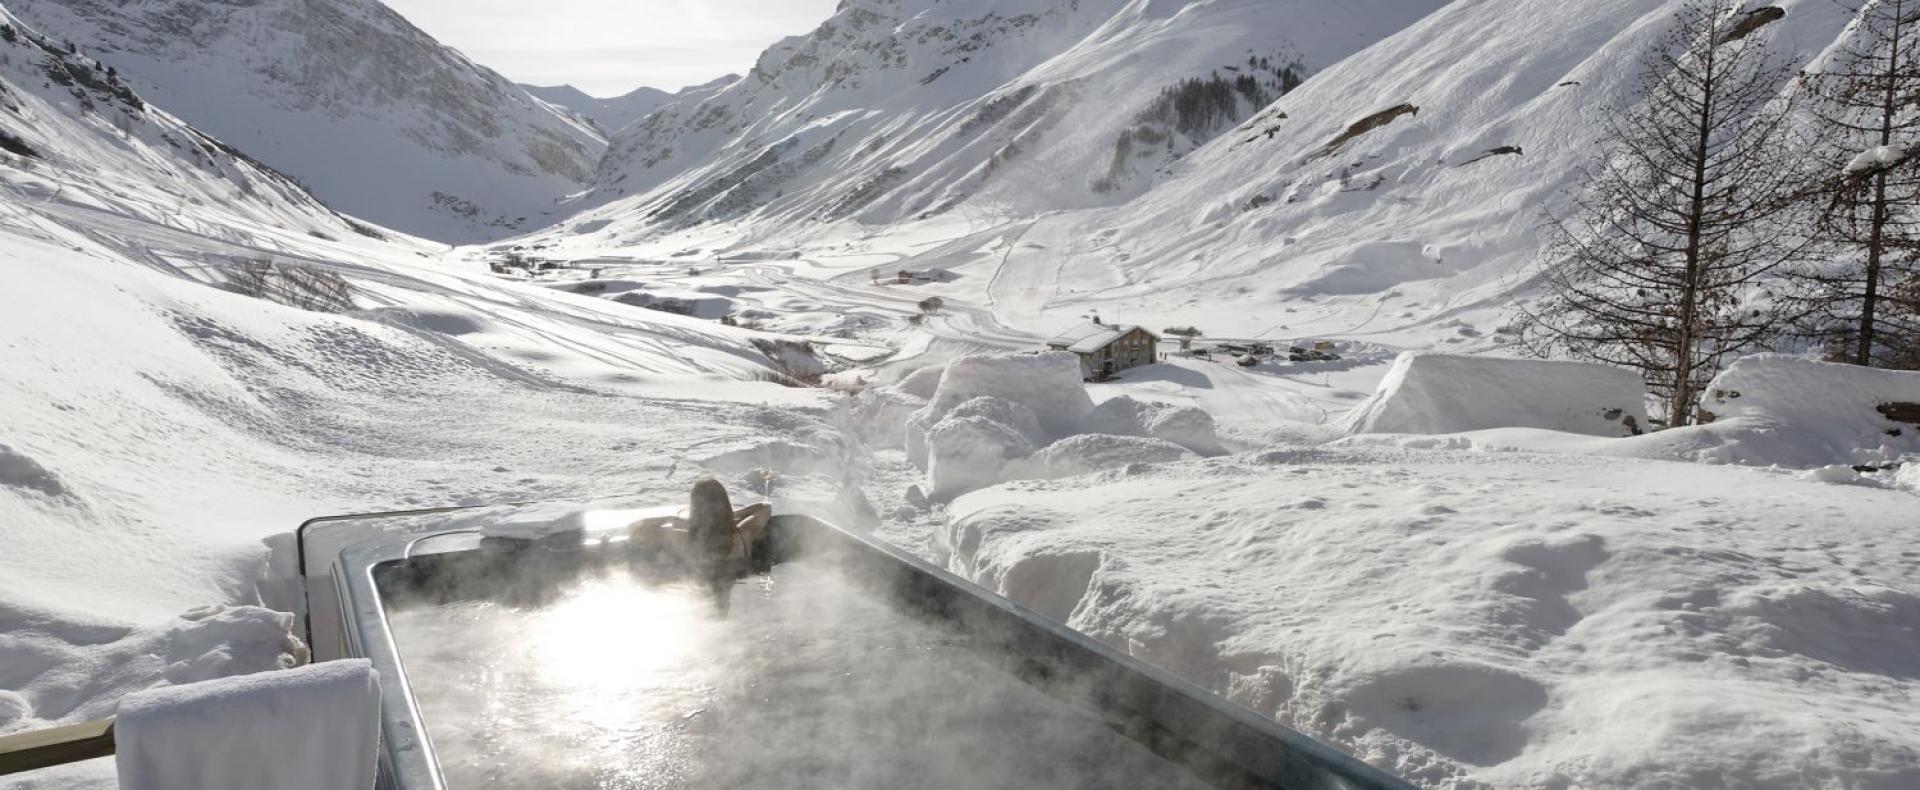 Hot-Tub-Chalet-Le-Chardon-Val-d'Isere-Ultimate-Luxury-Chalets-UltraVilla